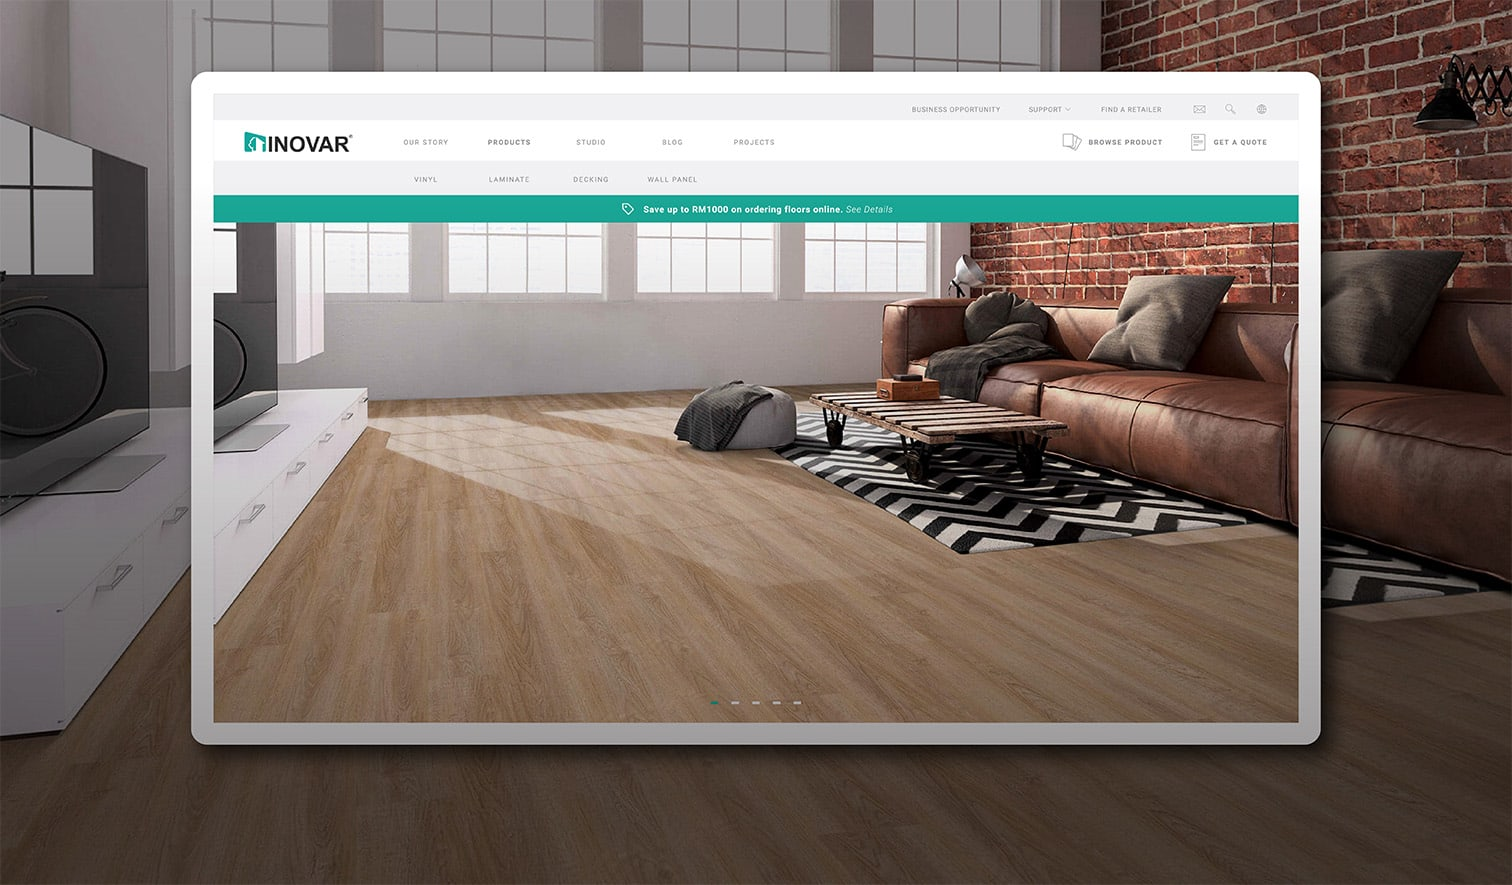 Unique Ecommerce Website Flooring Business